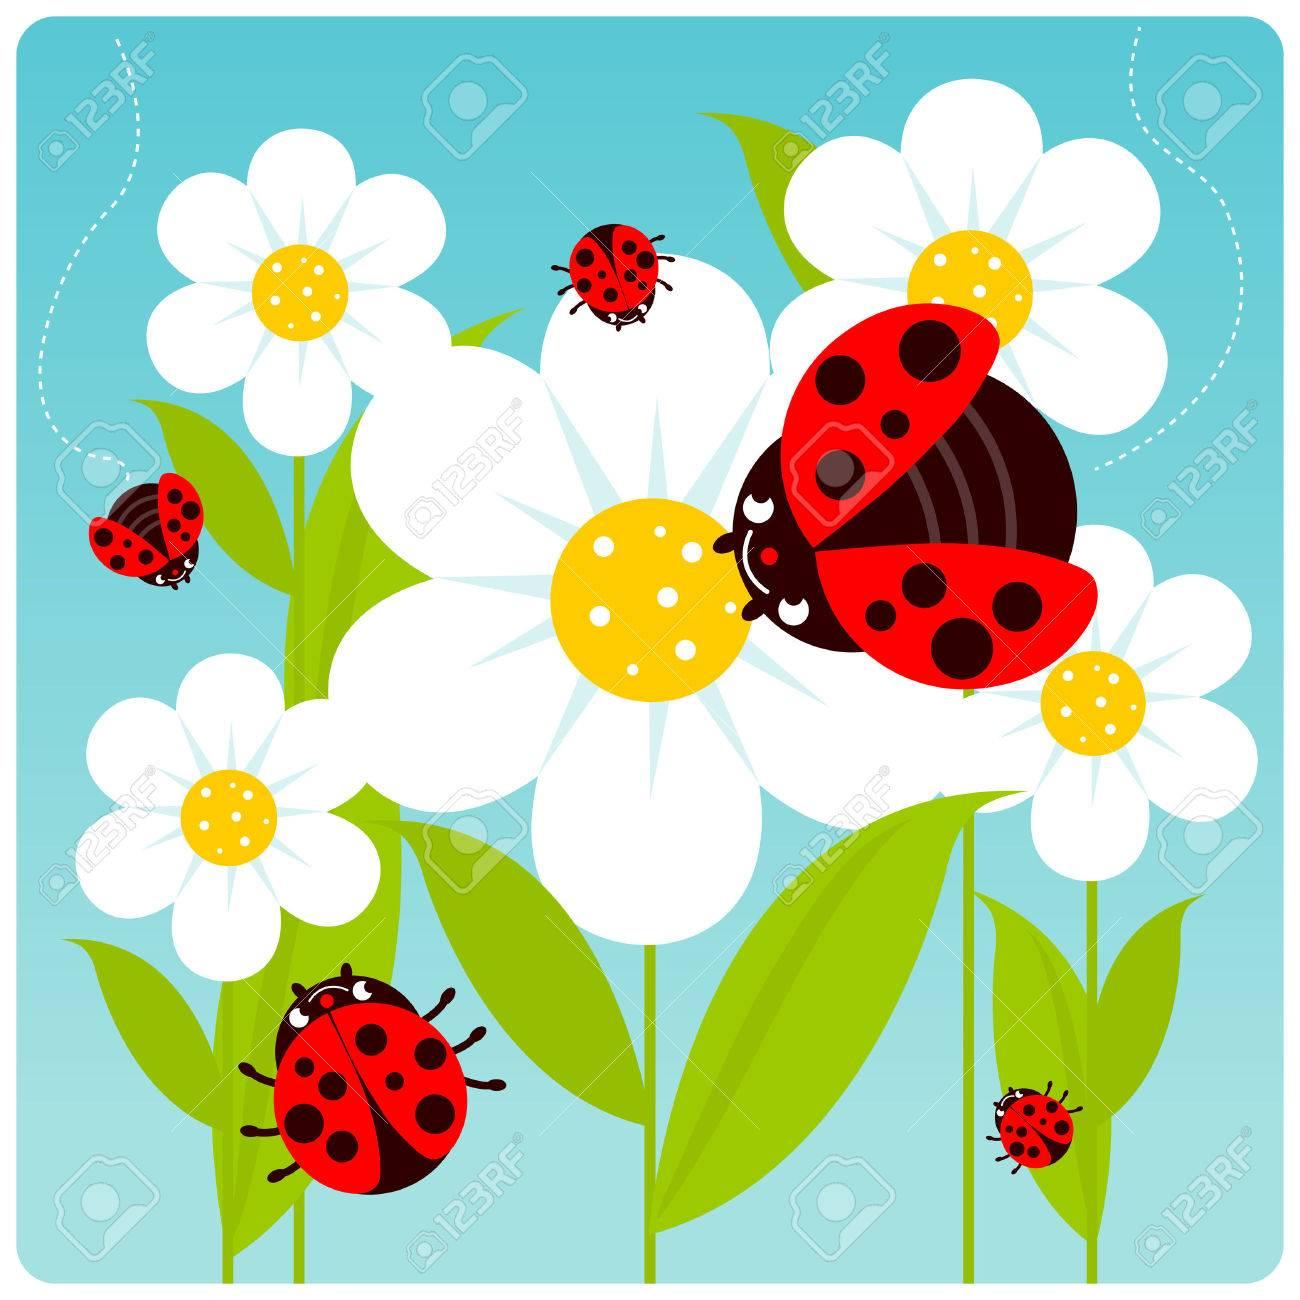 Ladybugs flying on white flowers in springtime - 44189273